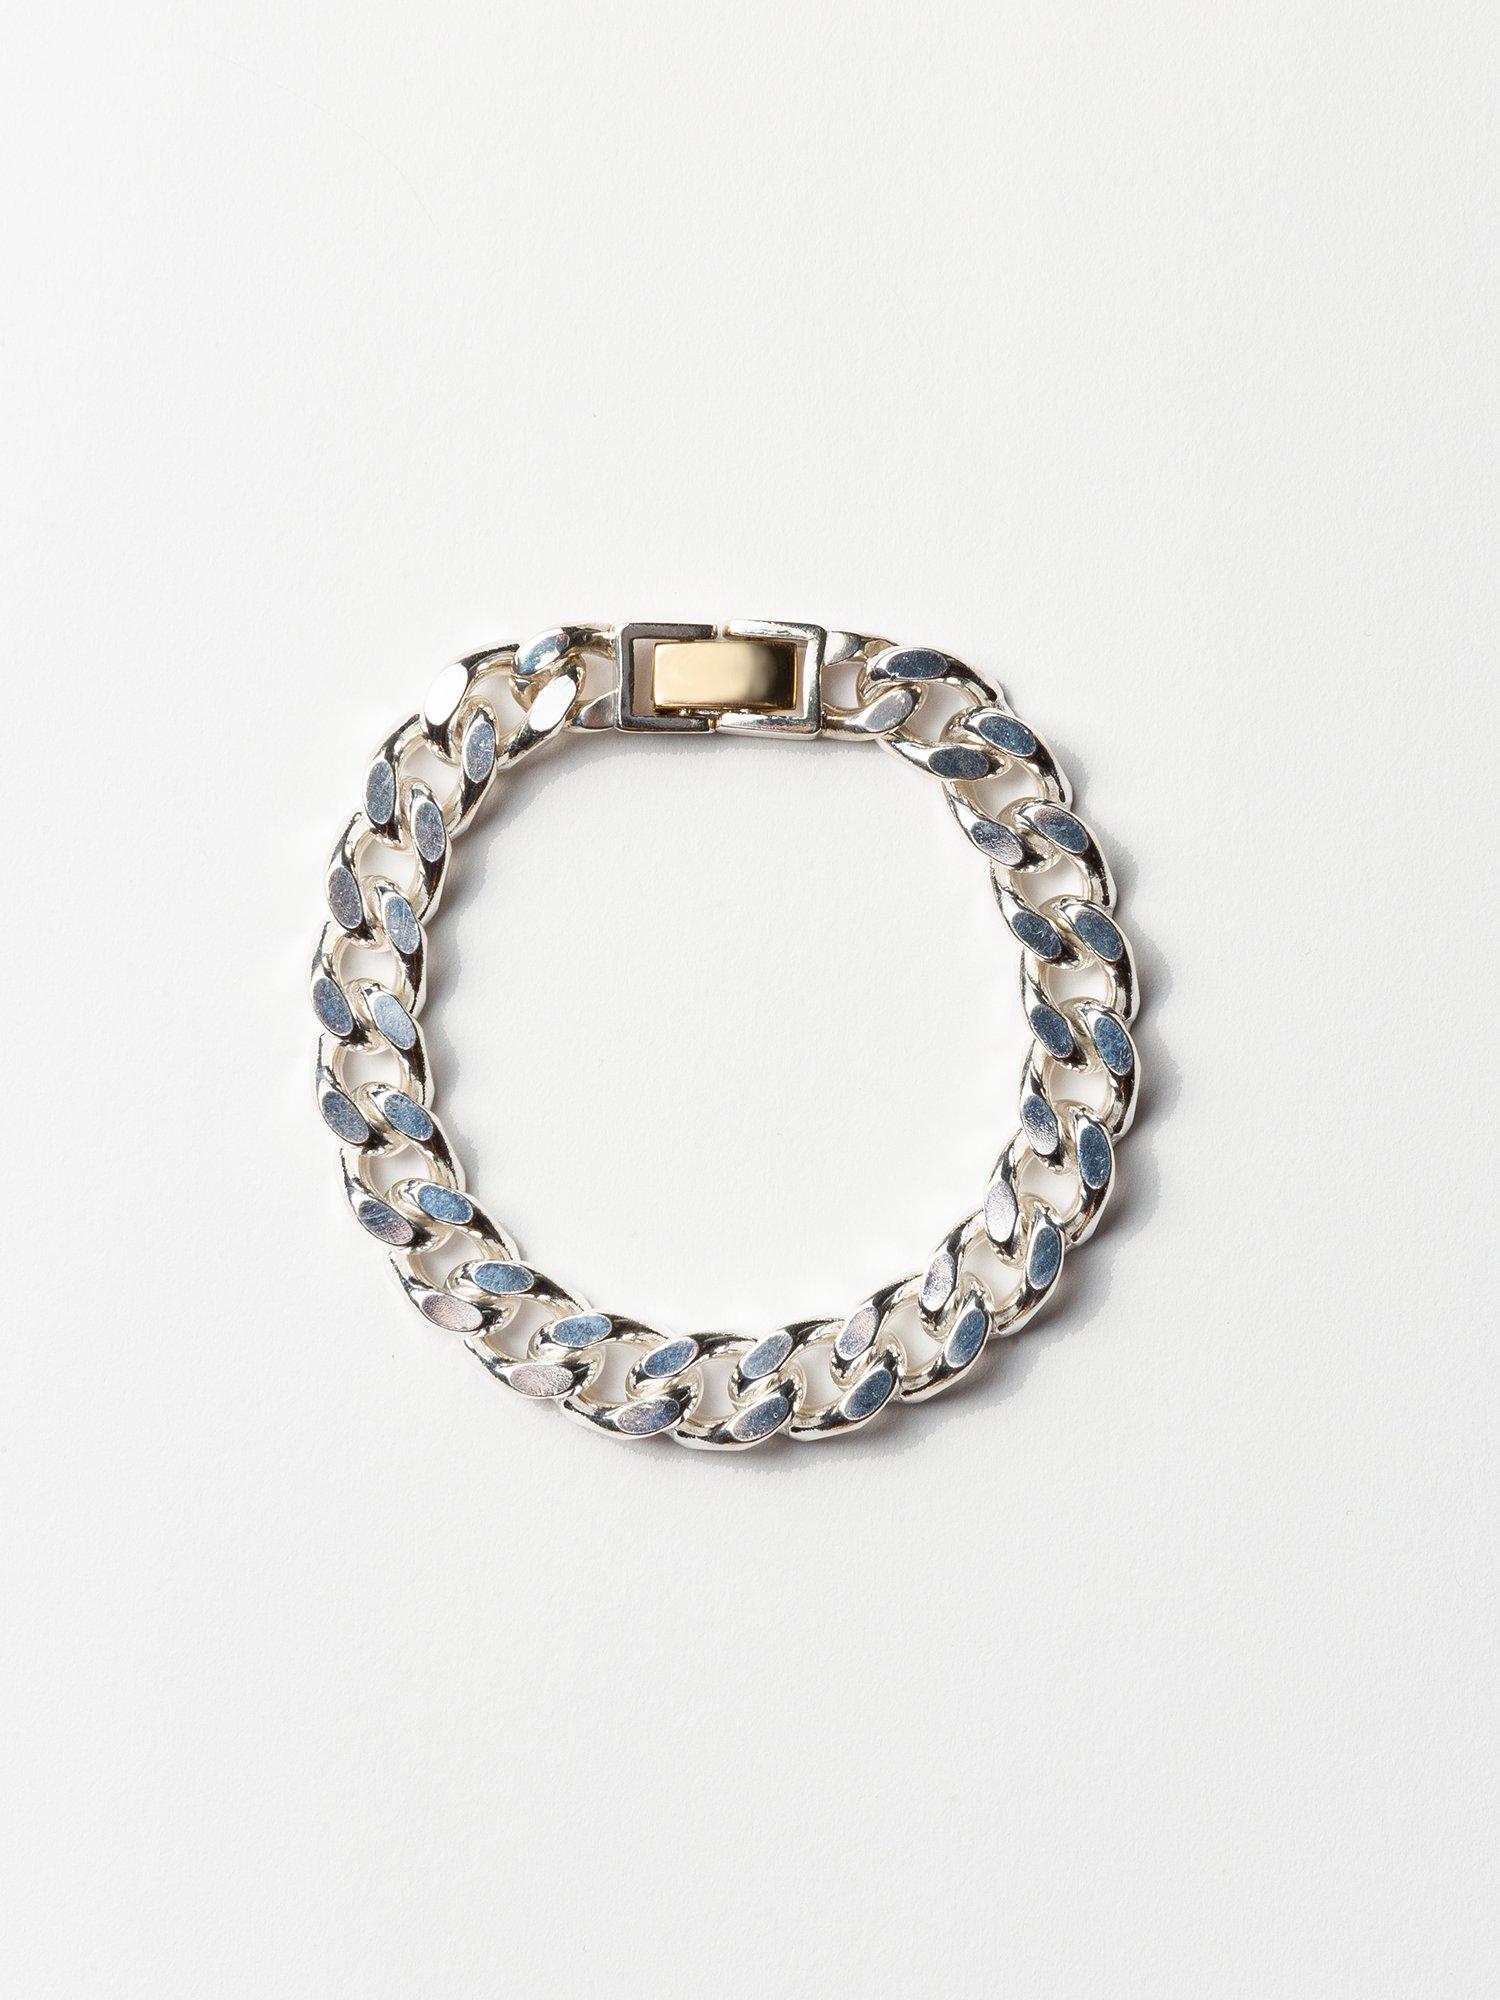 ARTEMIS / Gourmette bracelet / 170mm